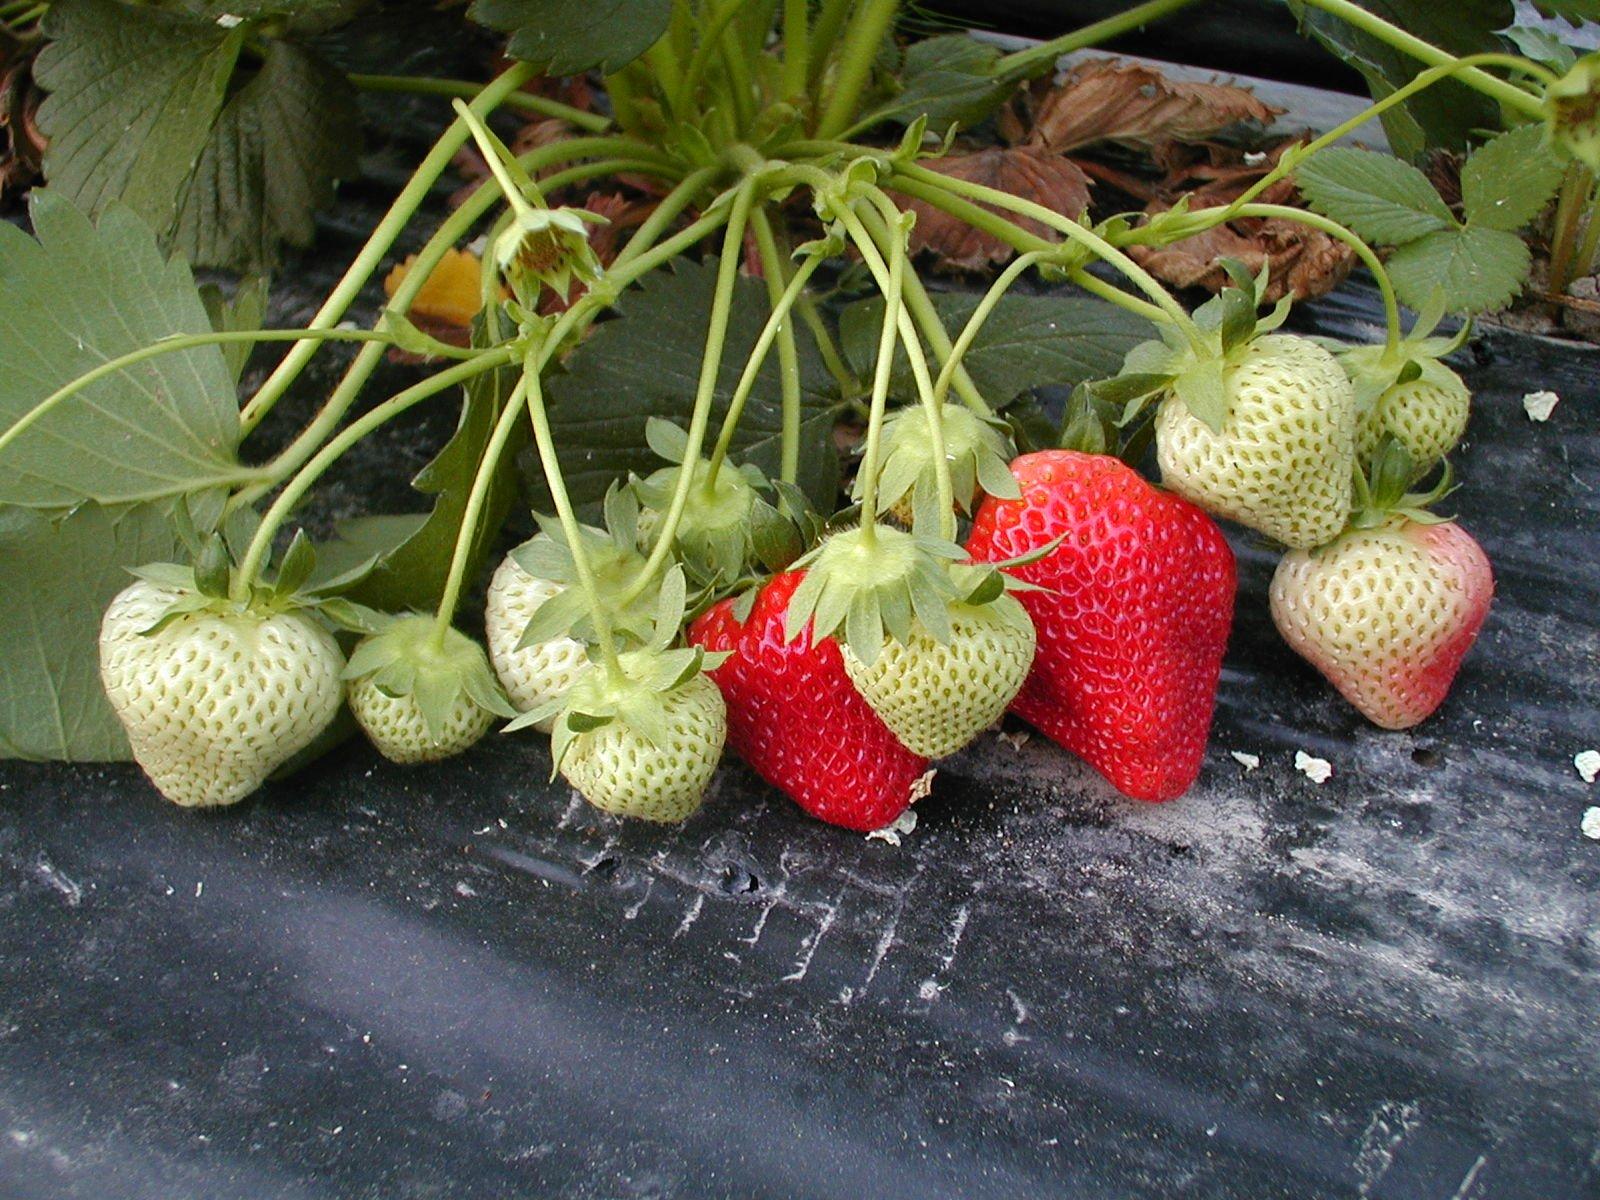 free plantation de fraises stock photo. Black Bedroom Furniture Sets. Home Design Ideas